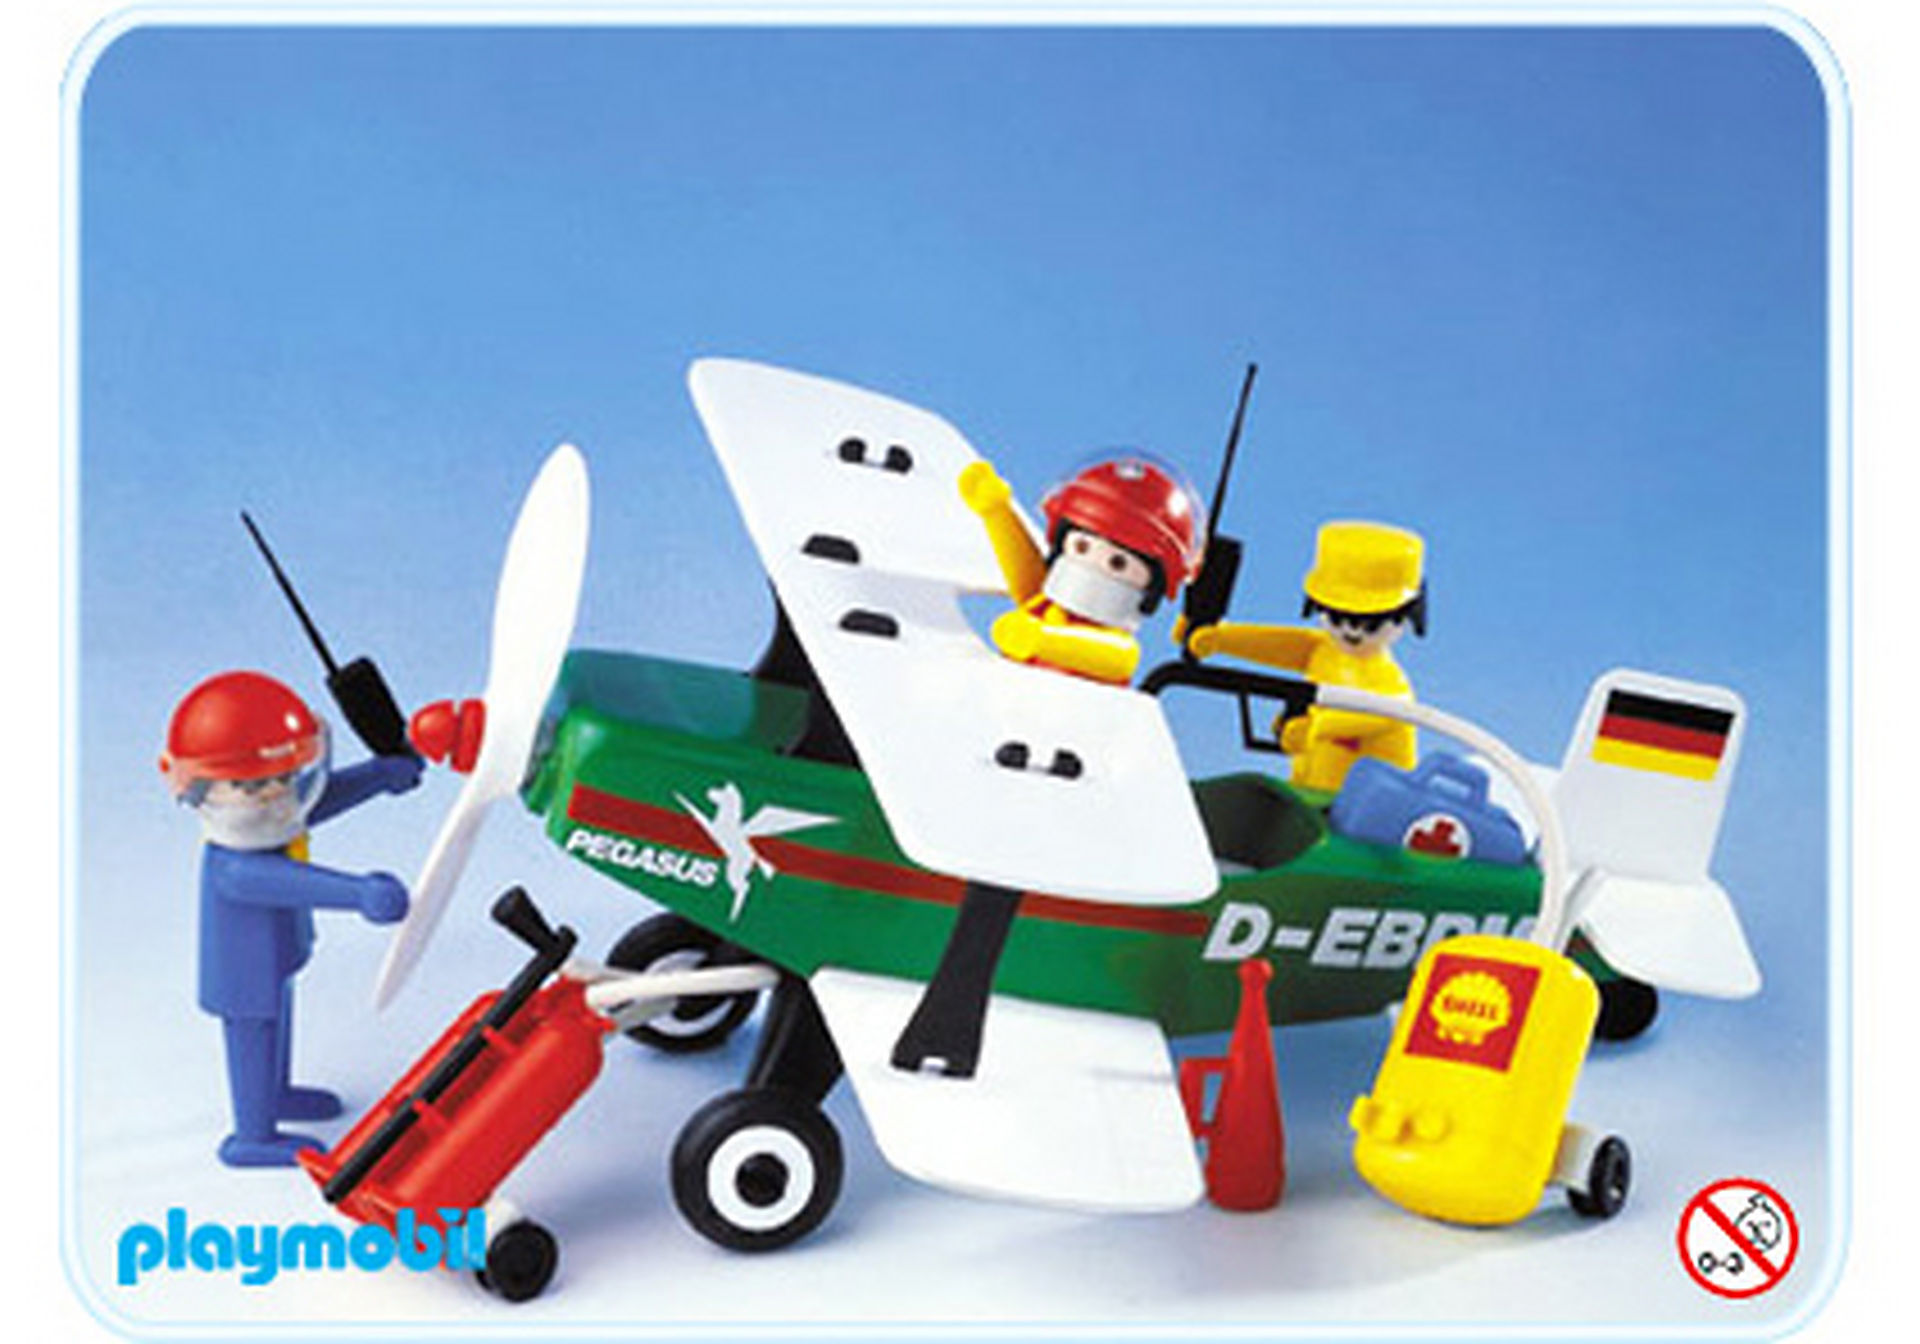 3246-A Flugzeug zoom image1